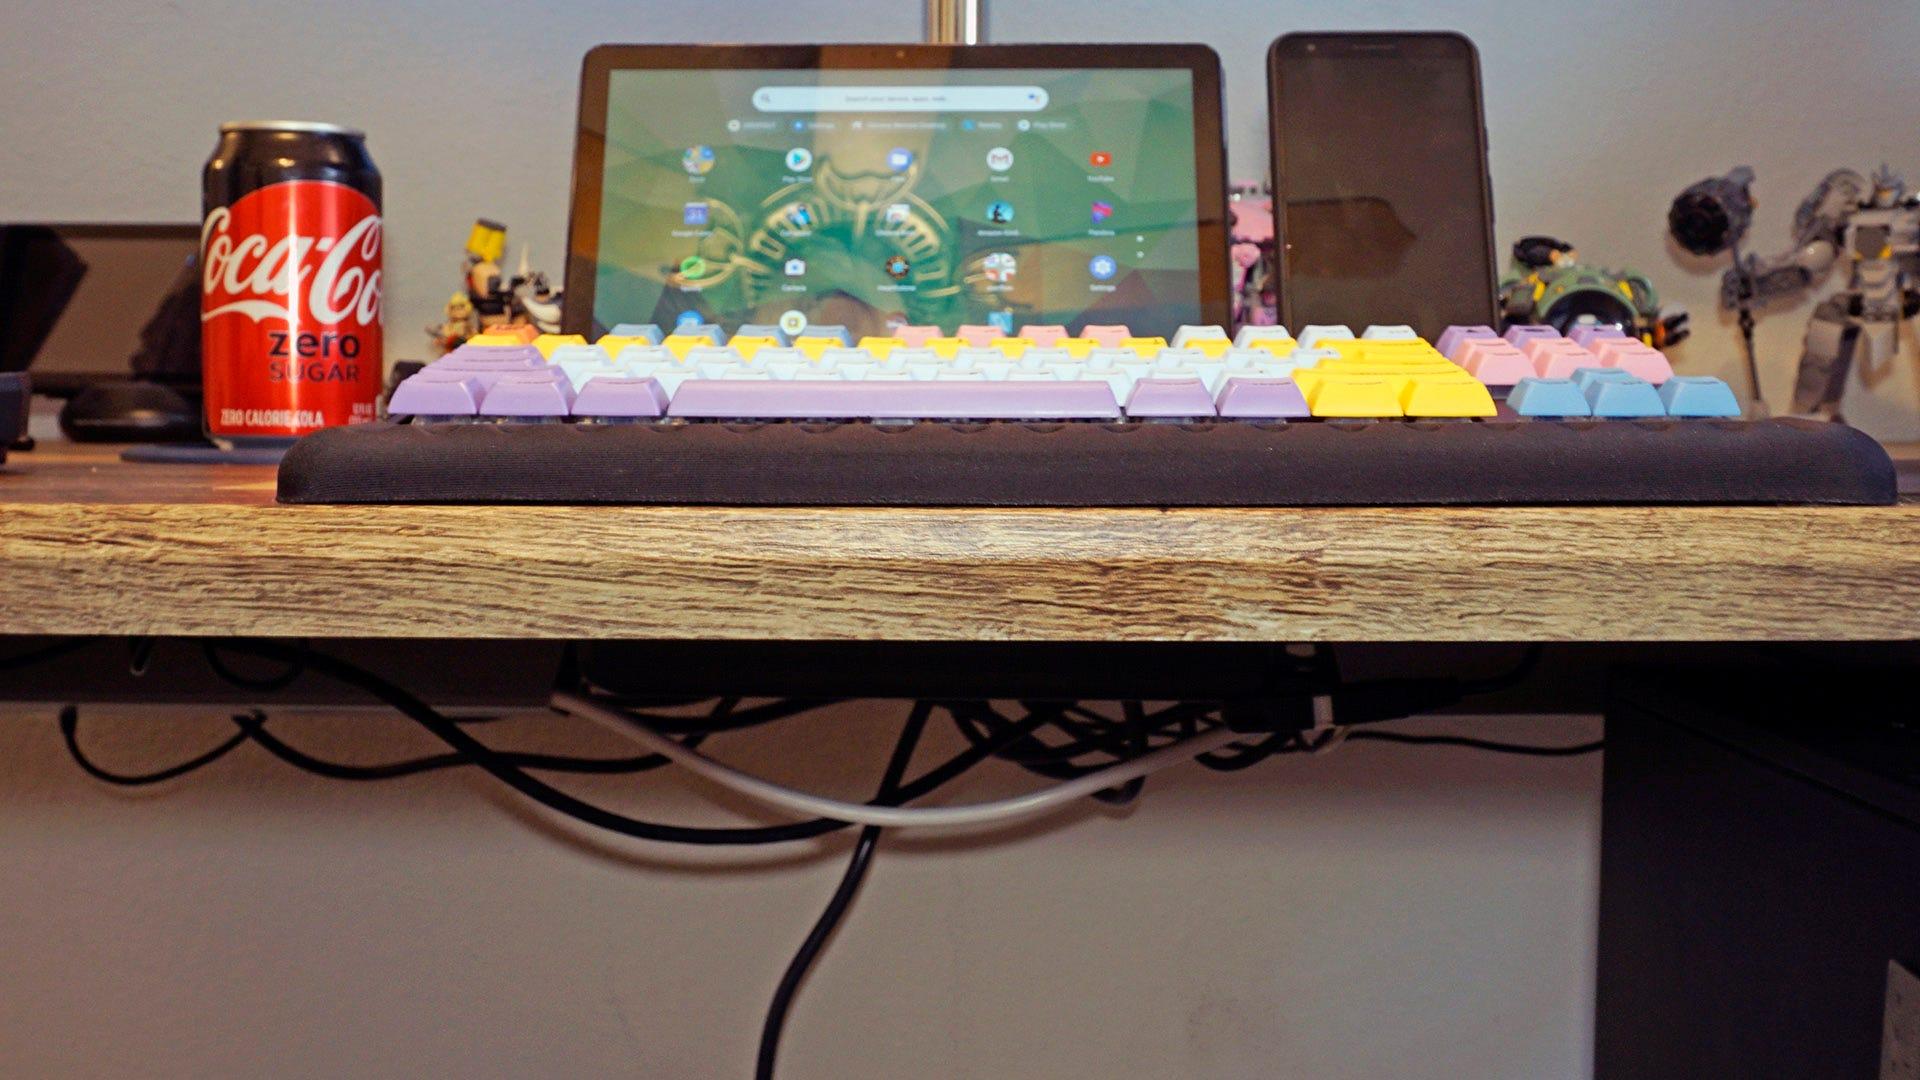 Vari Desk's thick top